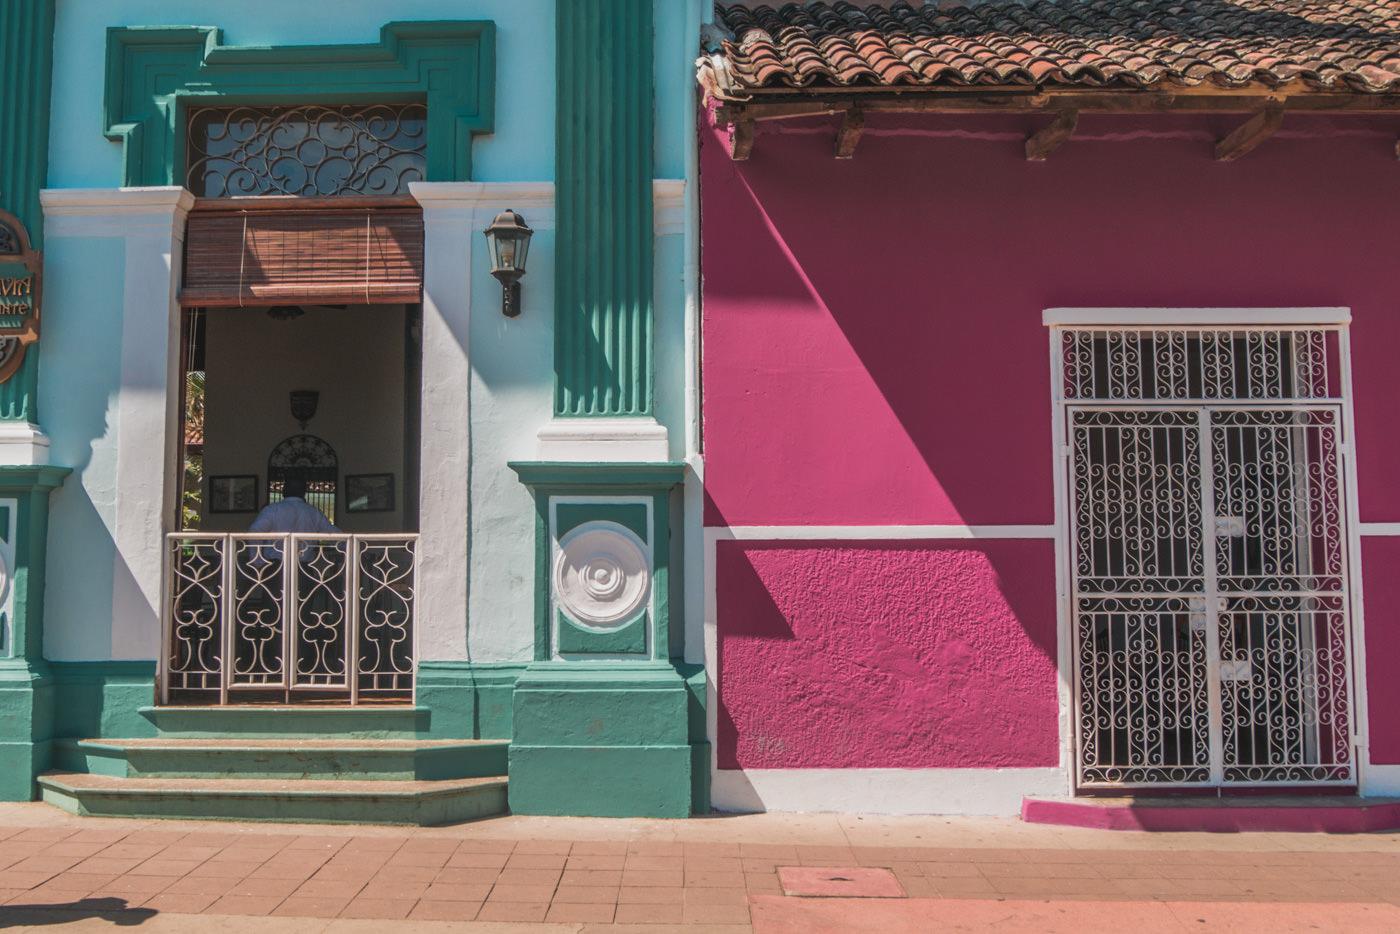 Bunte Häuserfassaden in Granada, Nicaragua